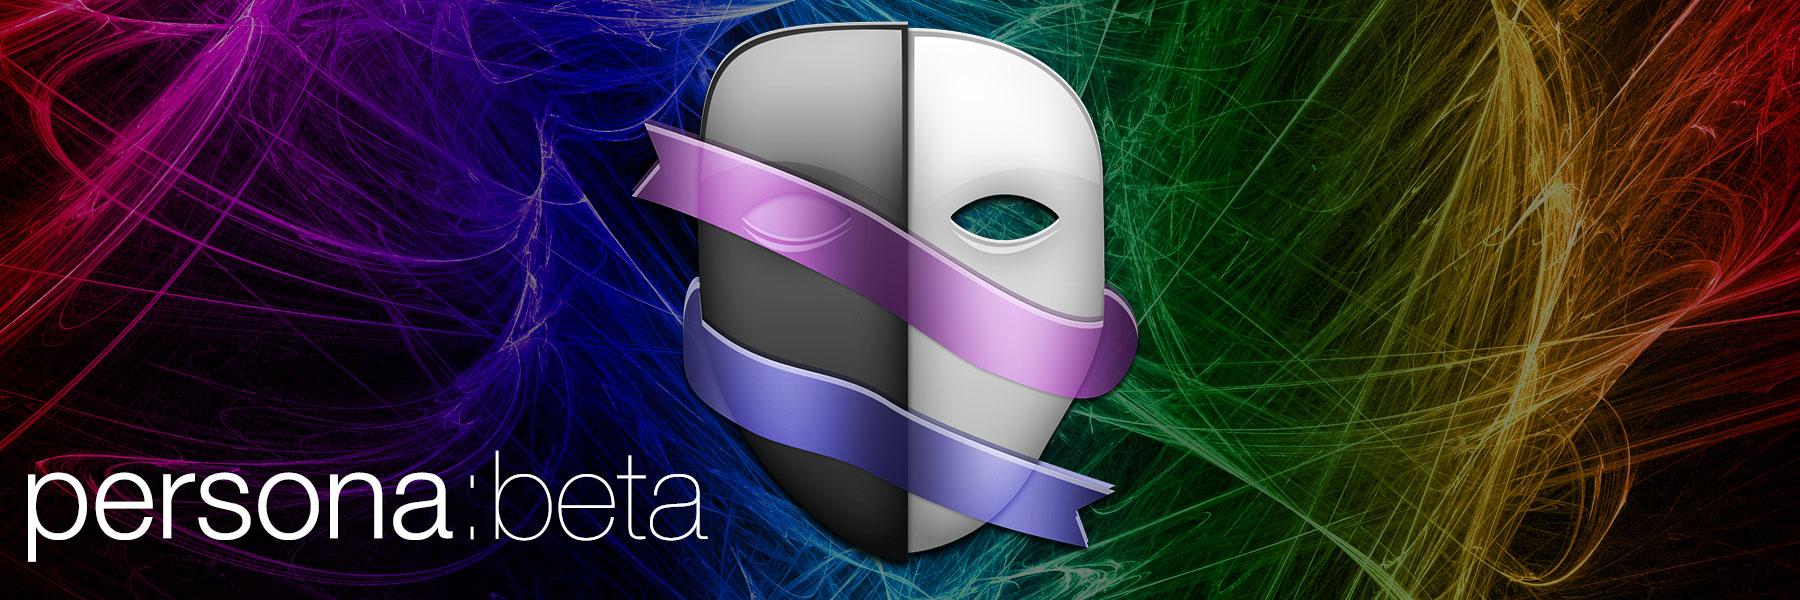 Banner do aplicativo Persona